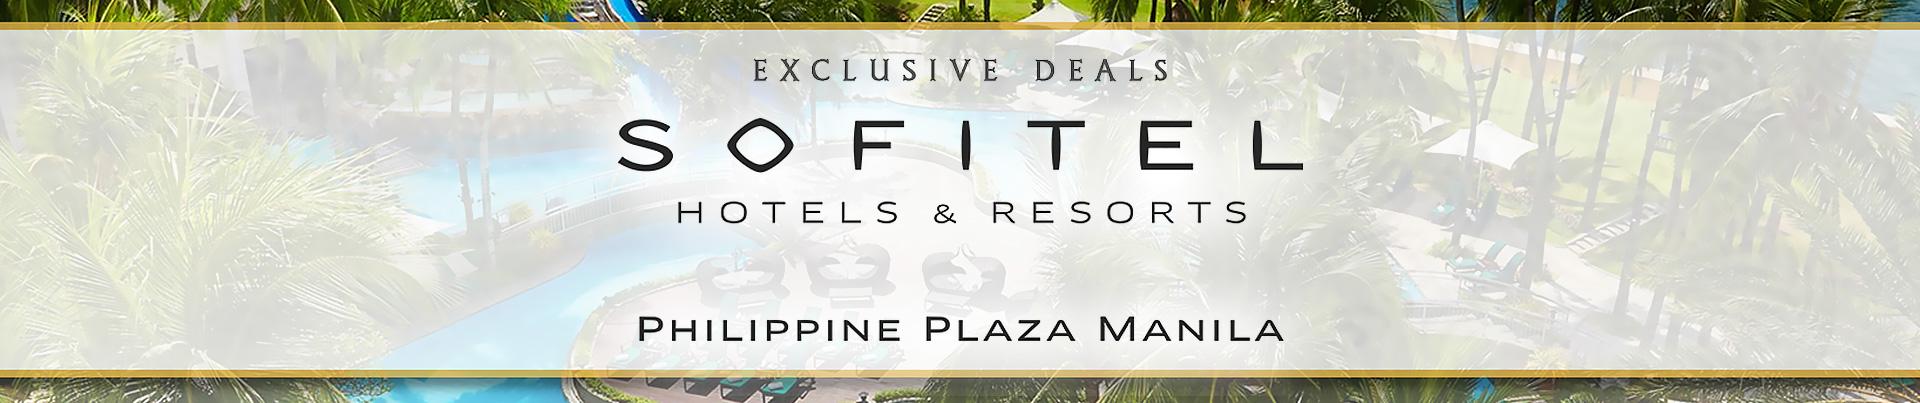 Sofitel Exclusive Deals